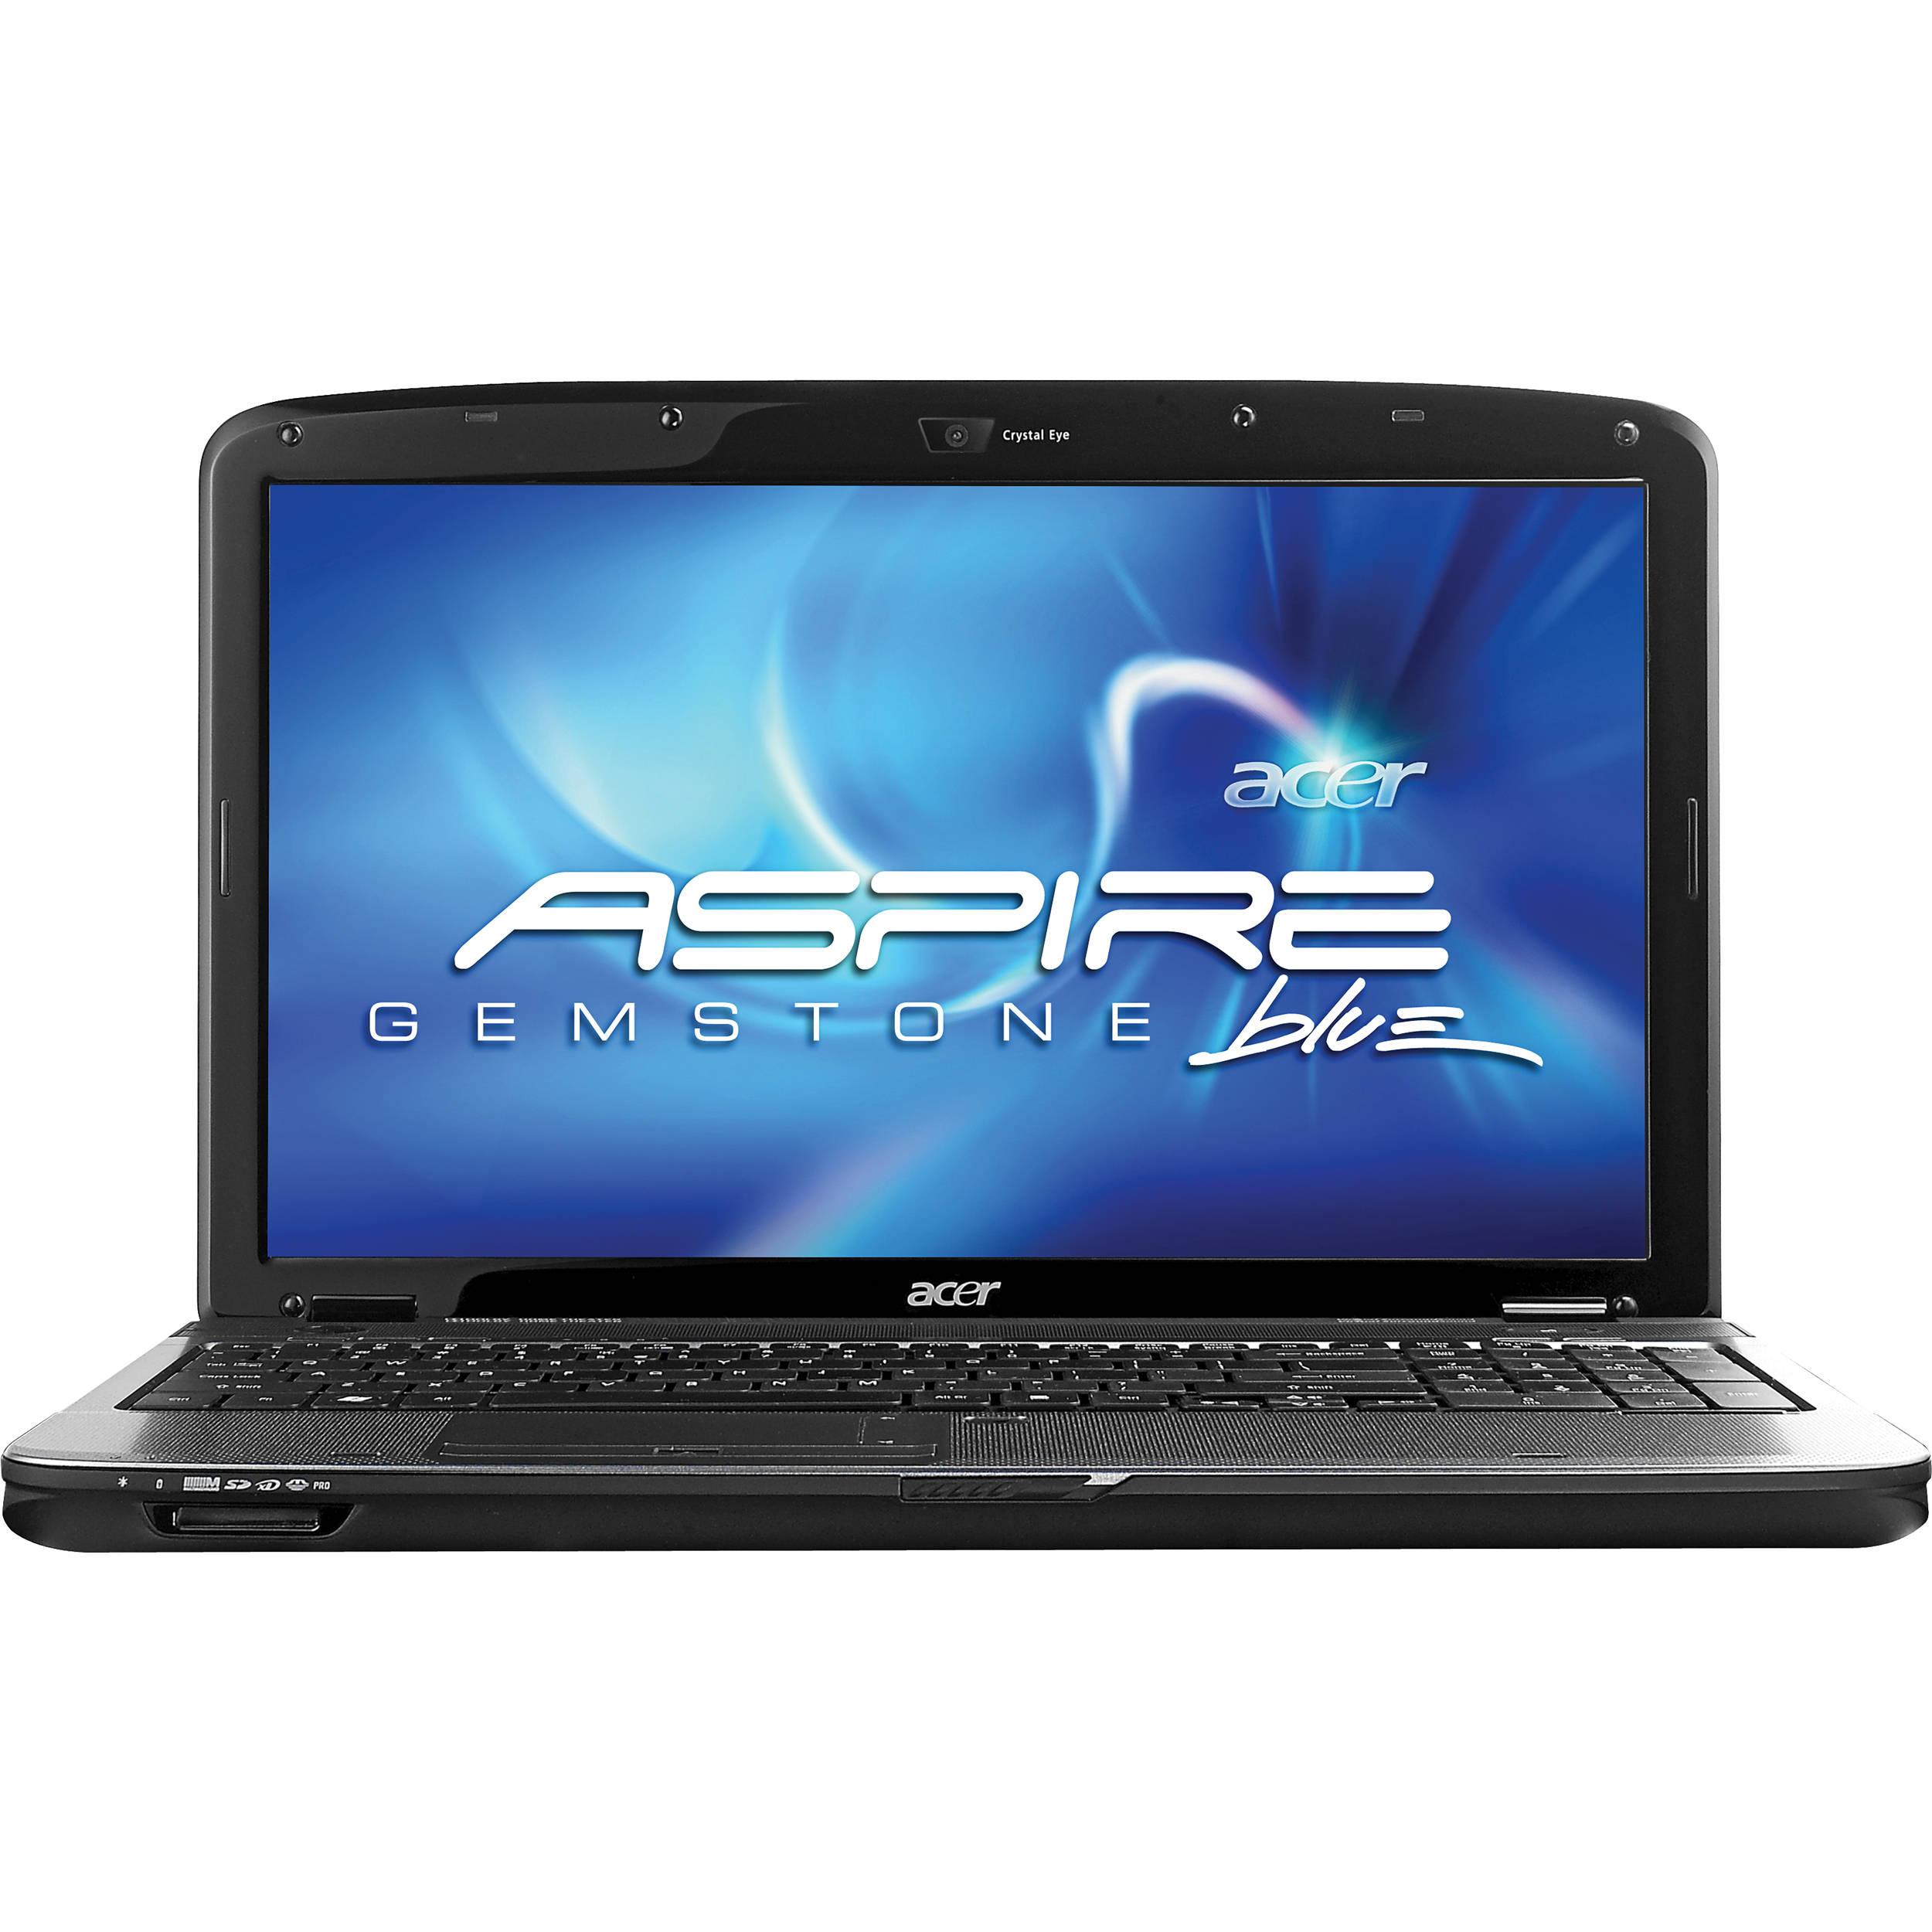 Acer Aspire 5740 Specs